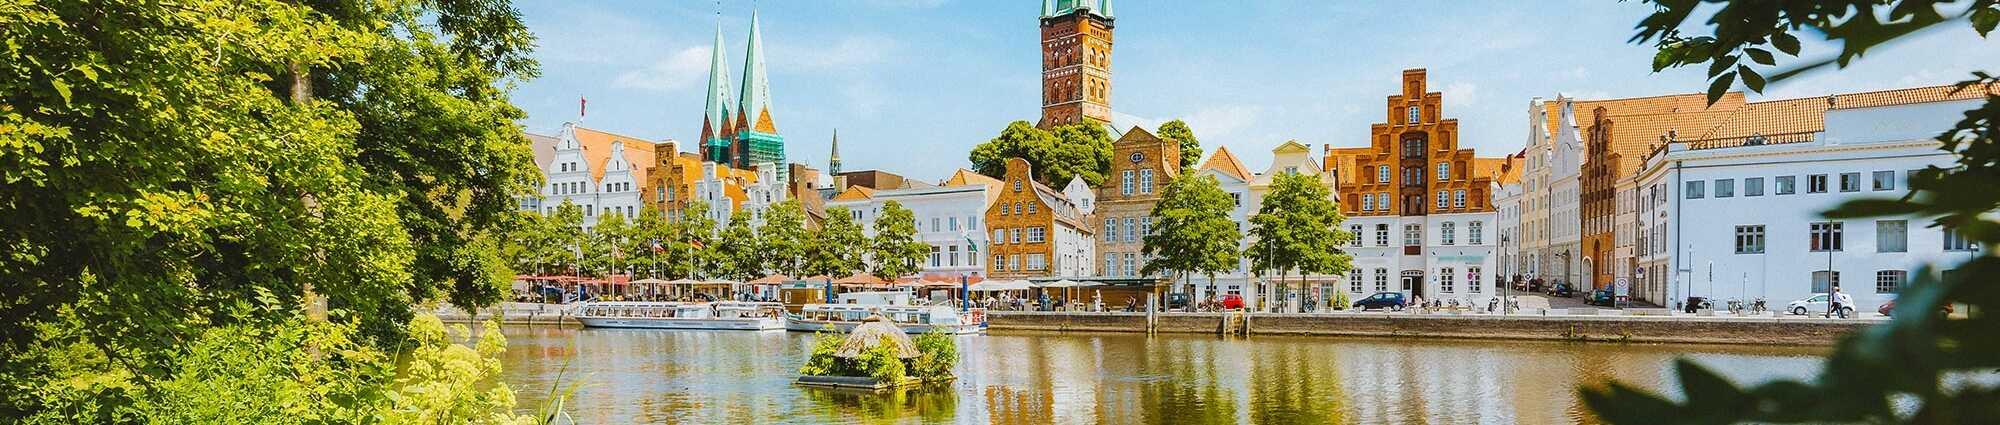 Danmark åbner op igen